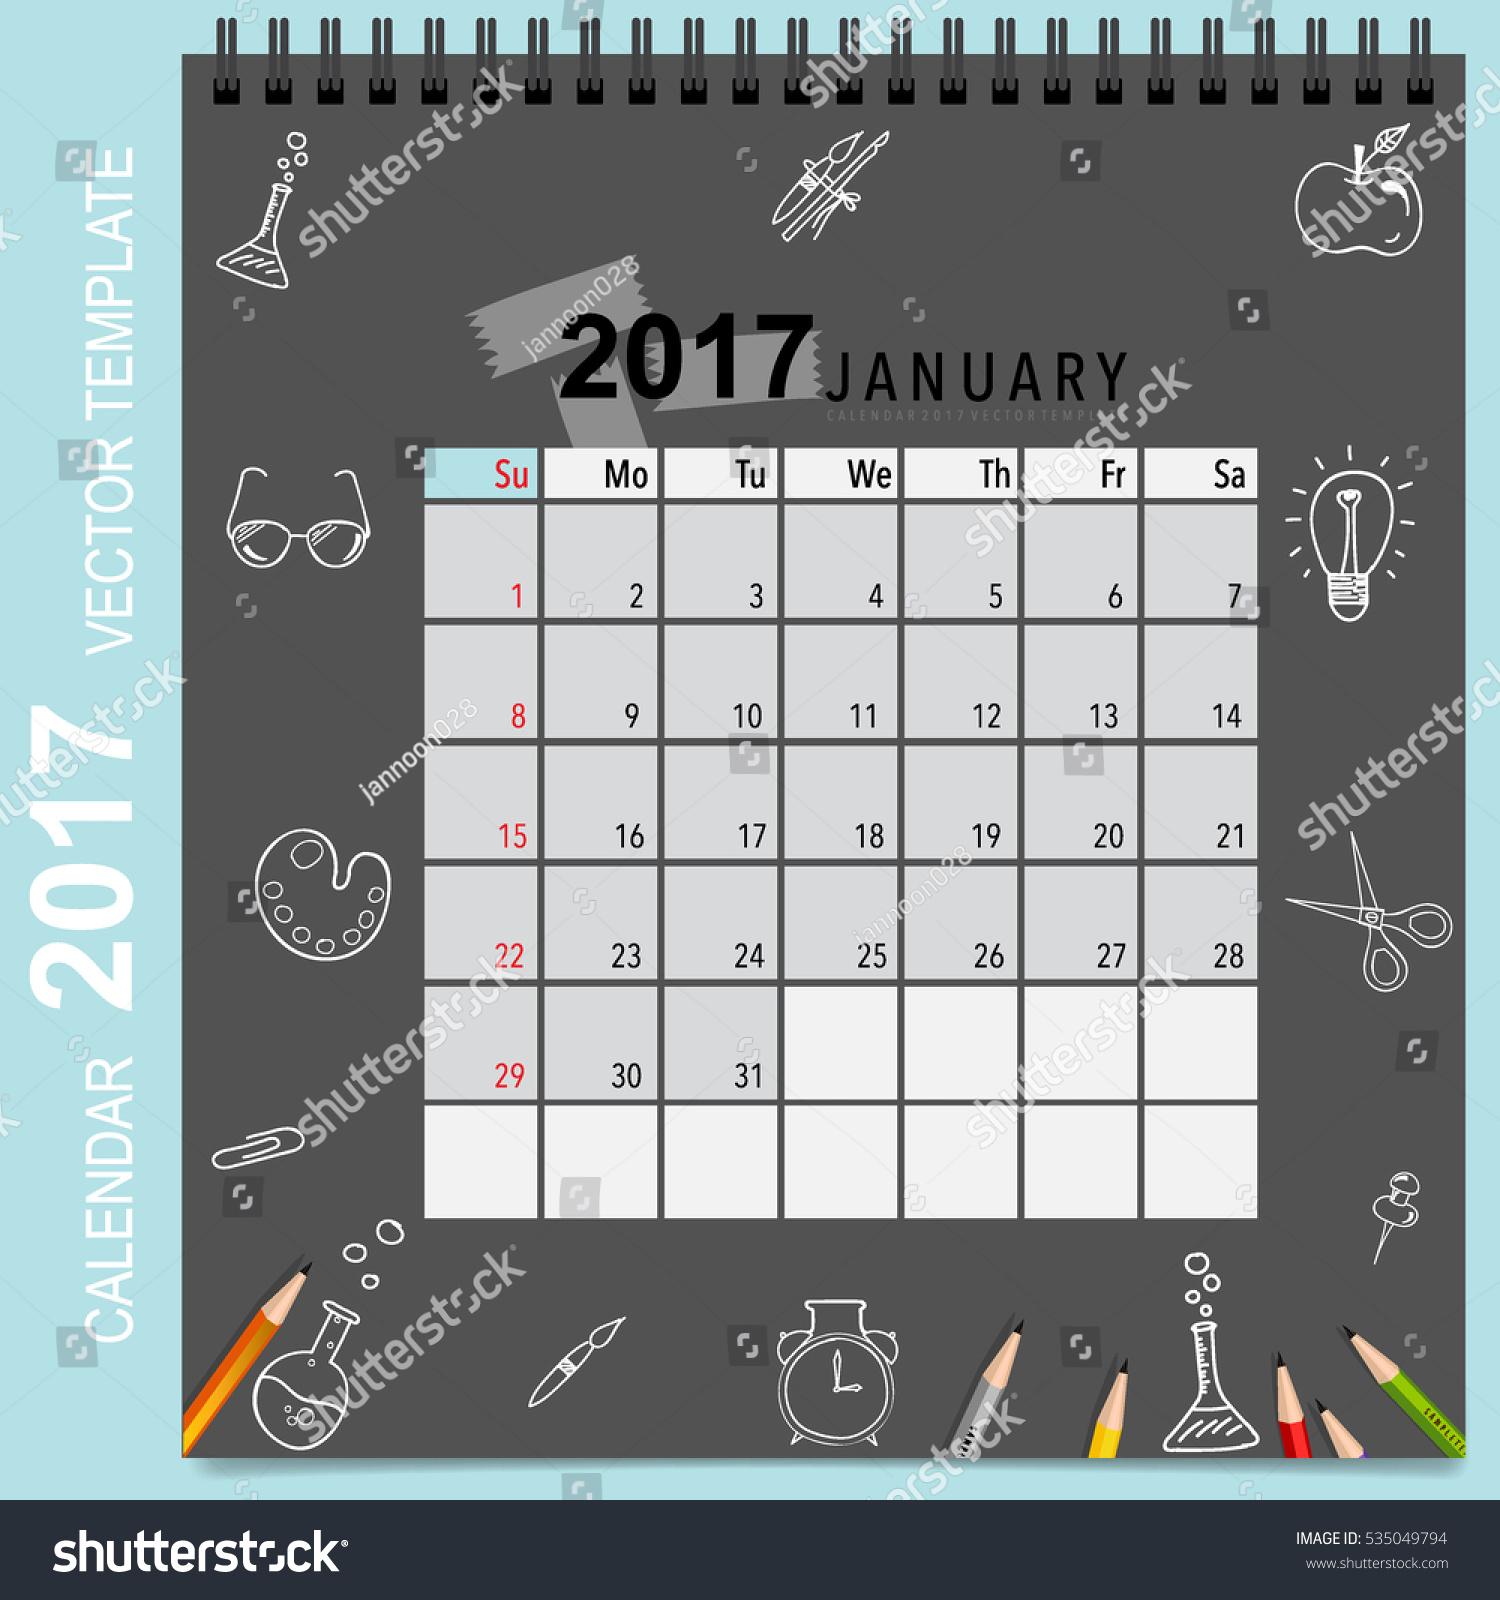 Calendar Planner Vector : Calendar planner vector design monthly stock